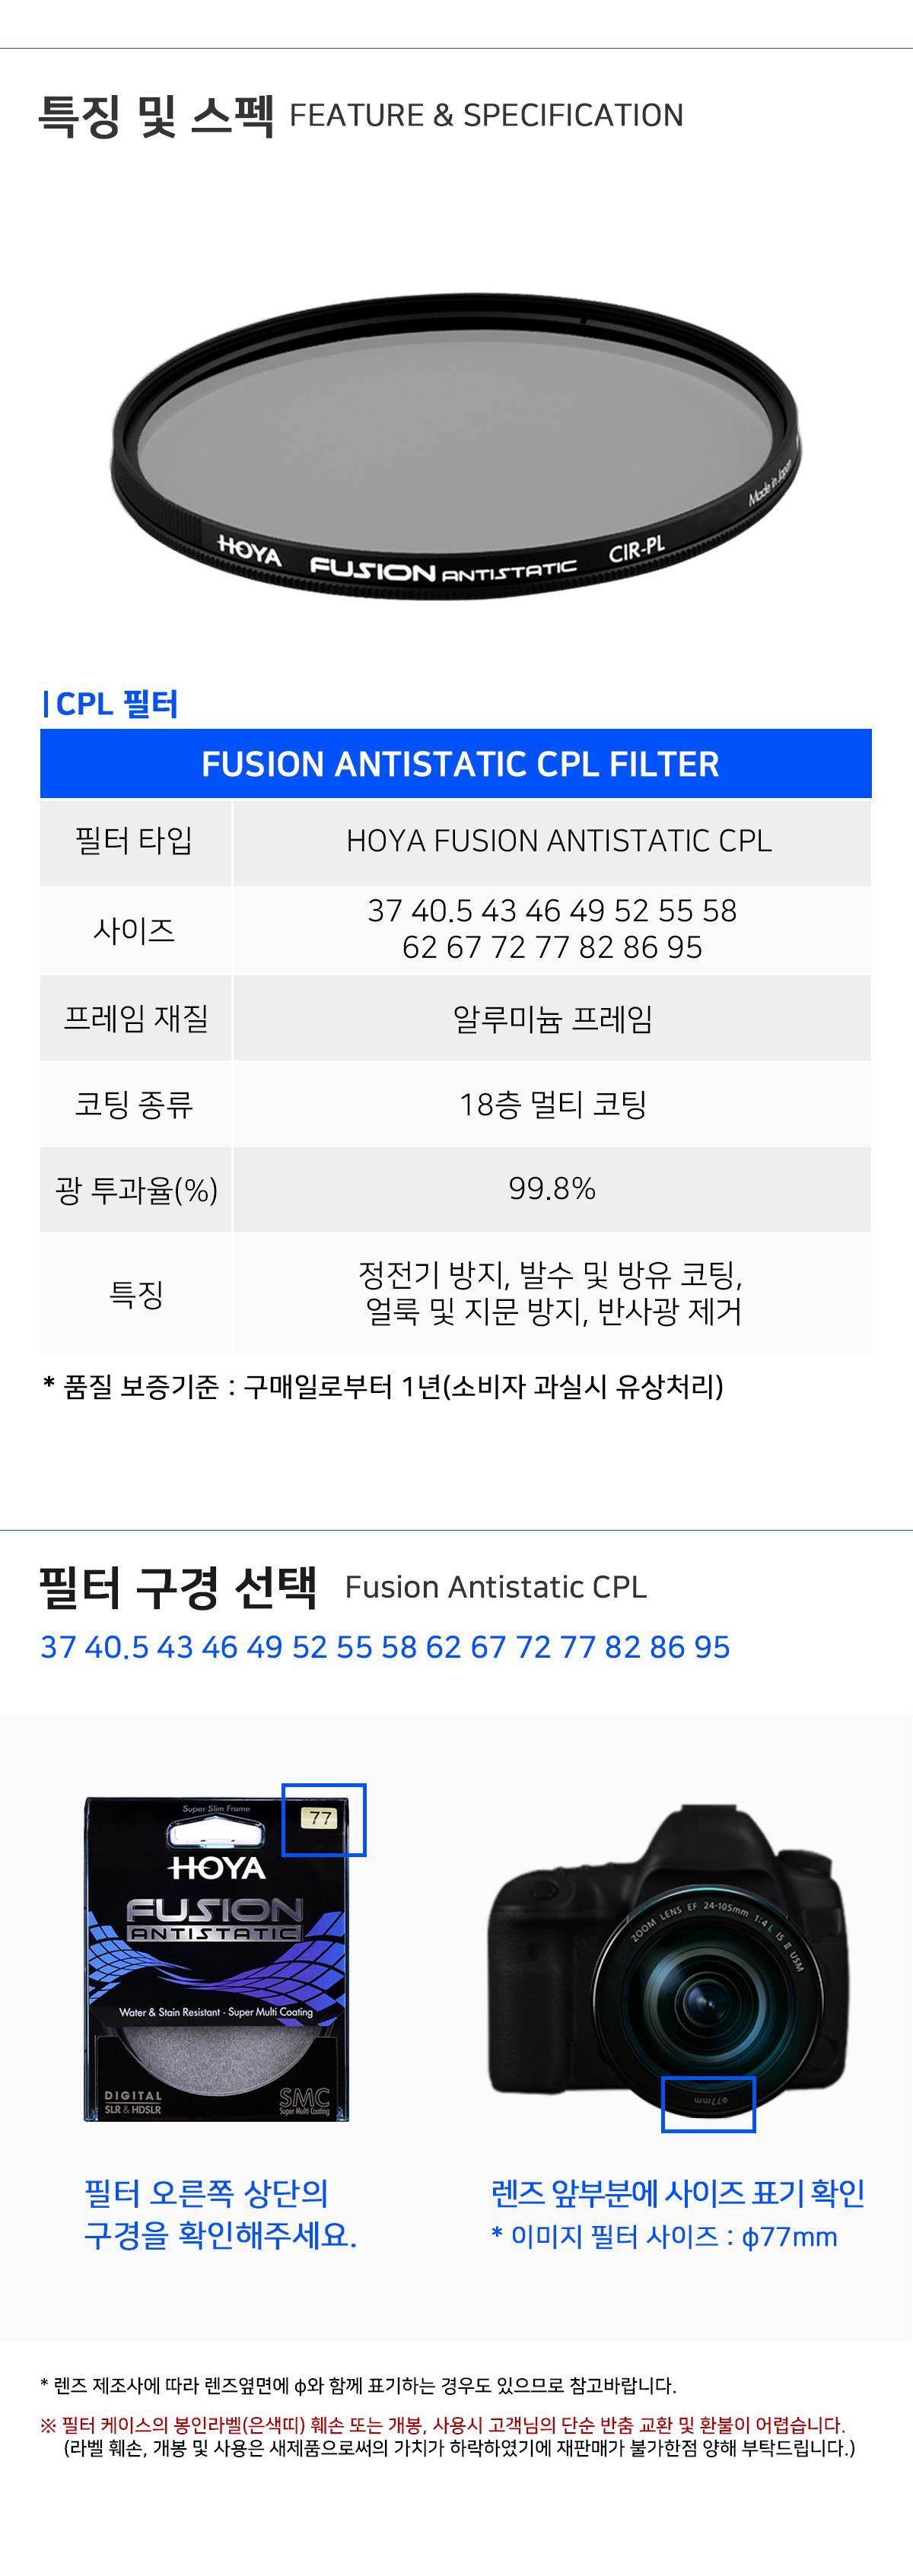 FUSION_ANTISTATIC_CPL_04.jpg